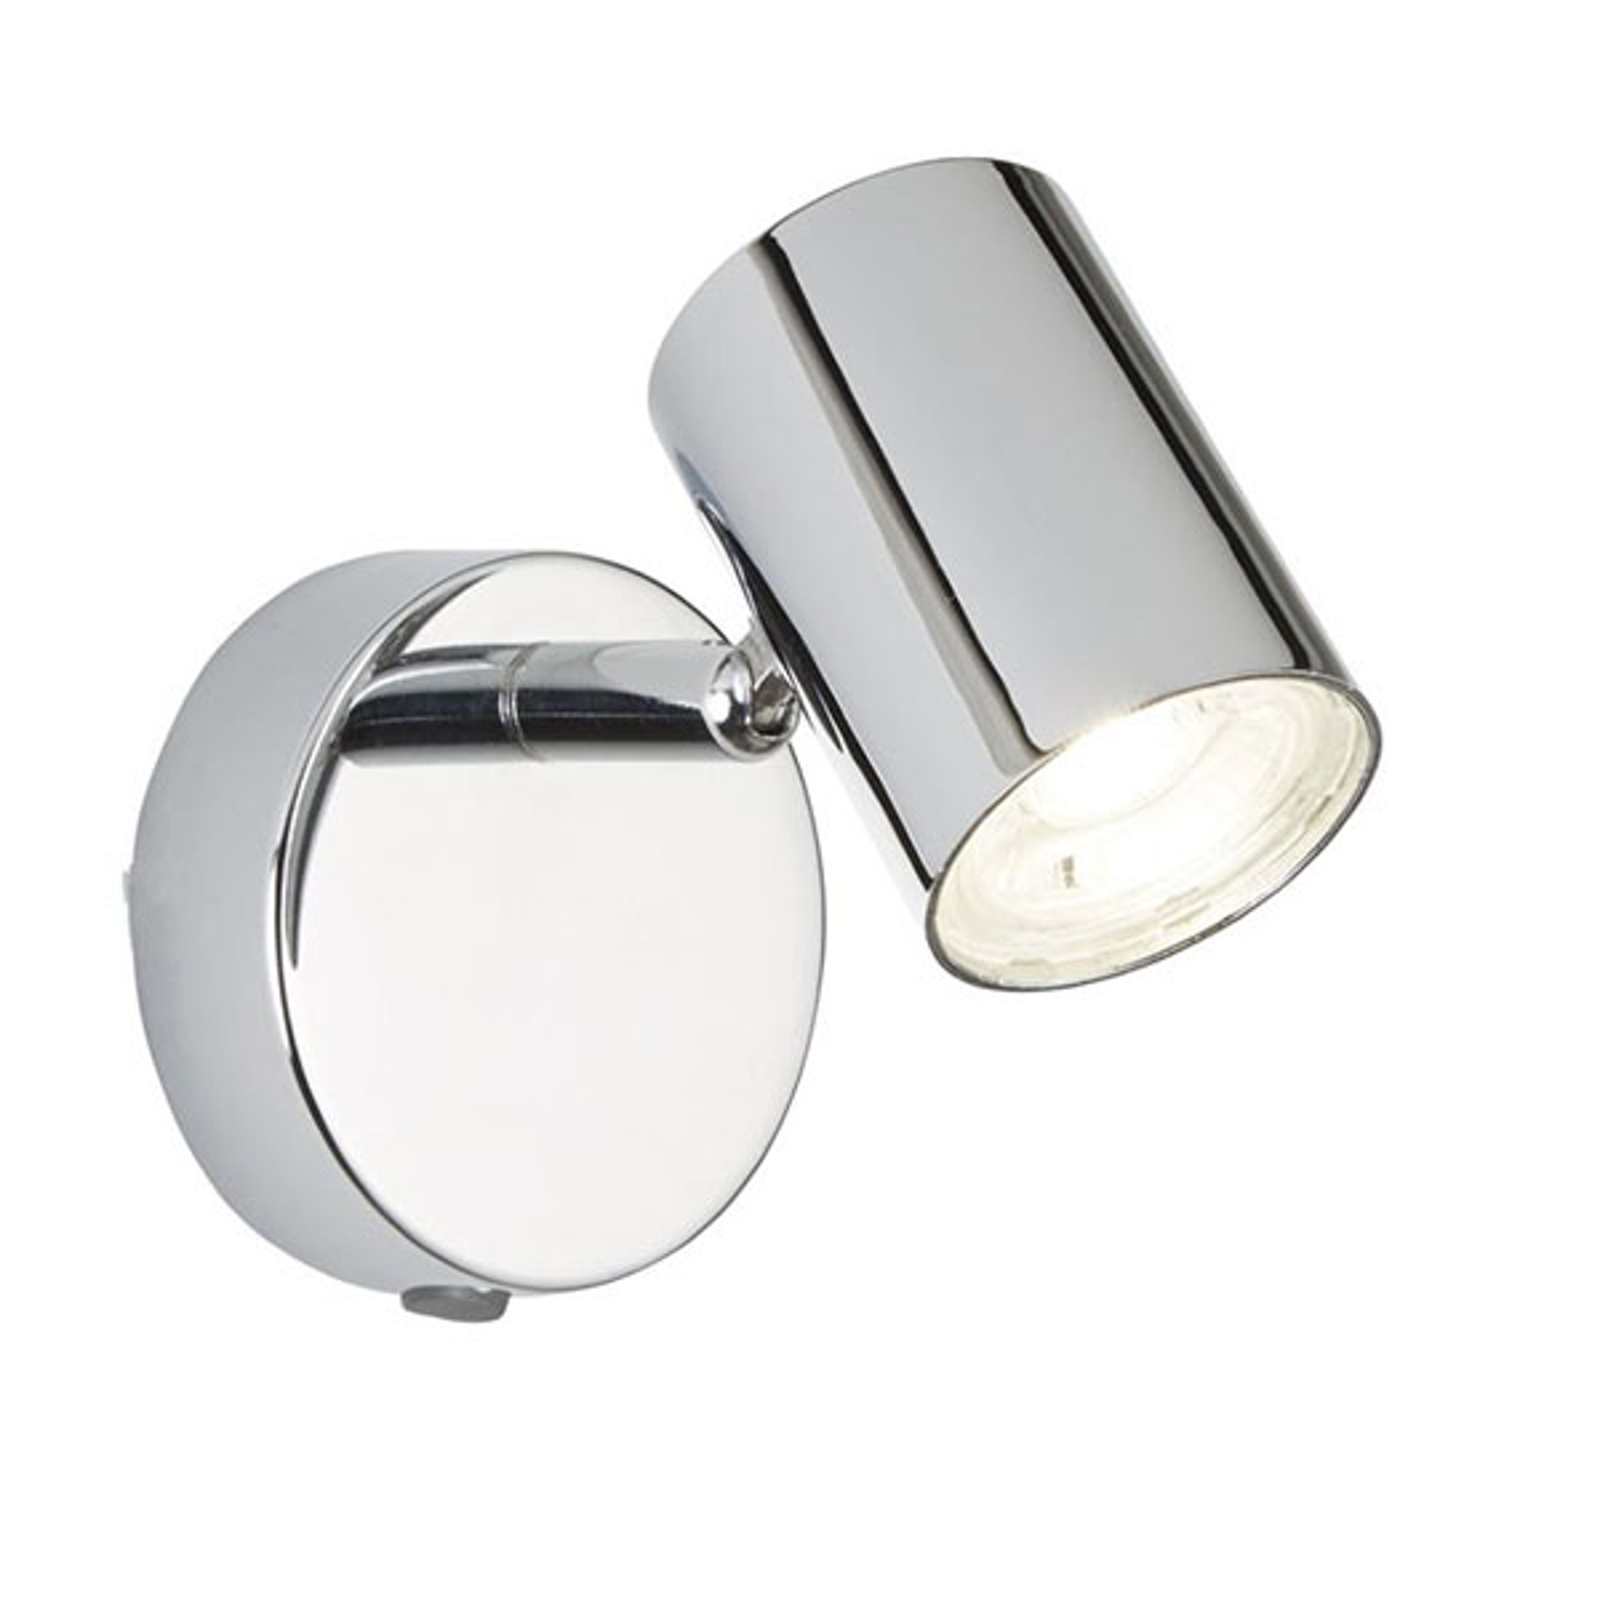 LED-veggspot Rollo, krom med bryter